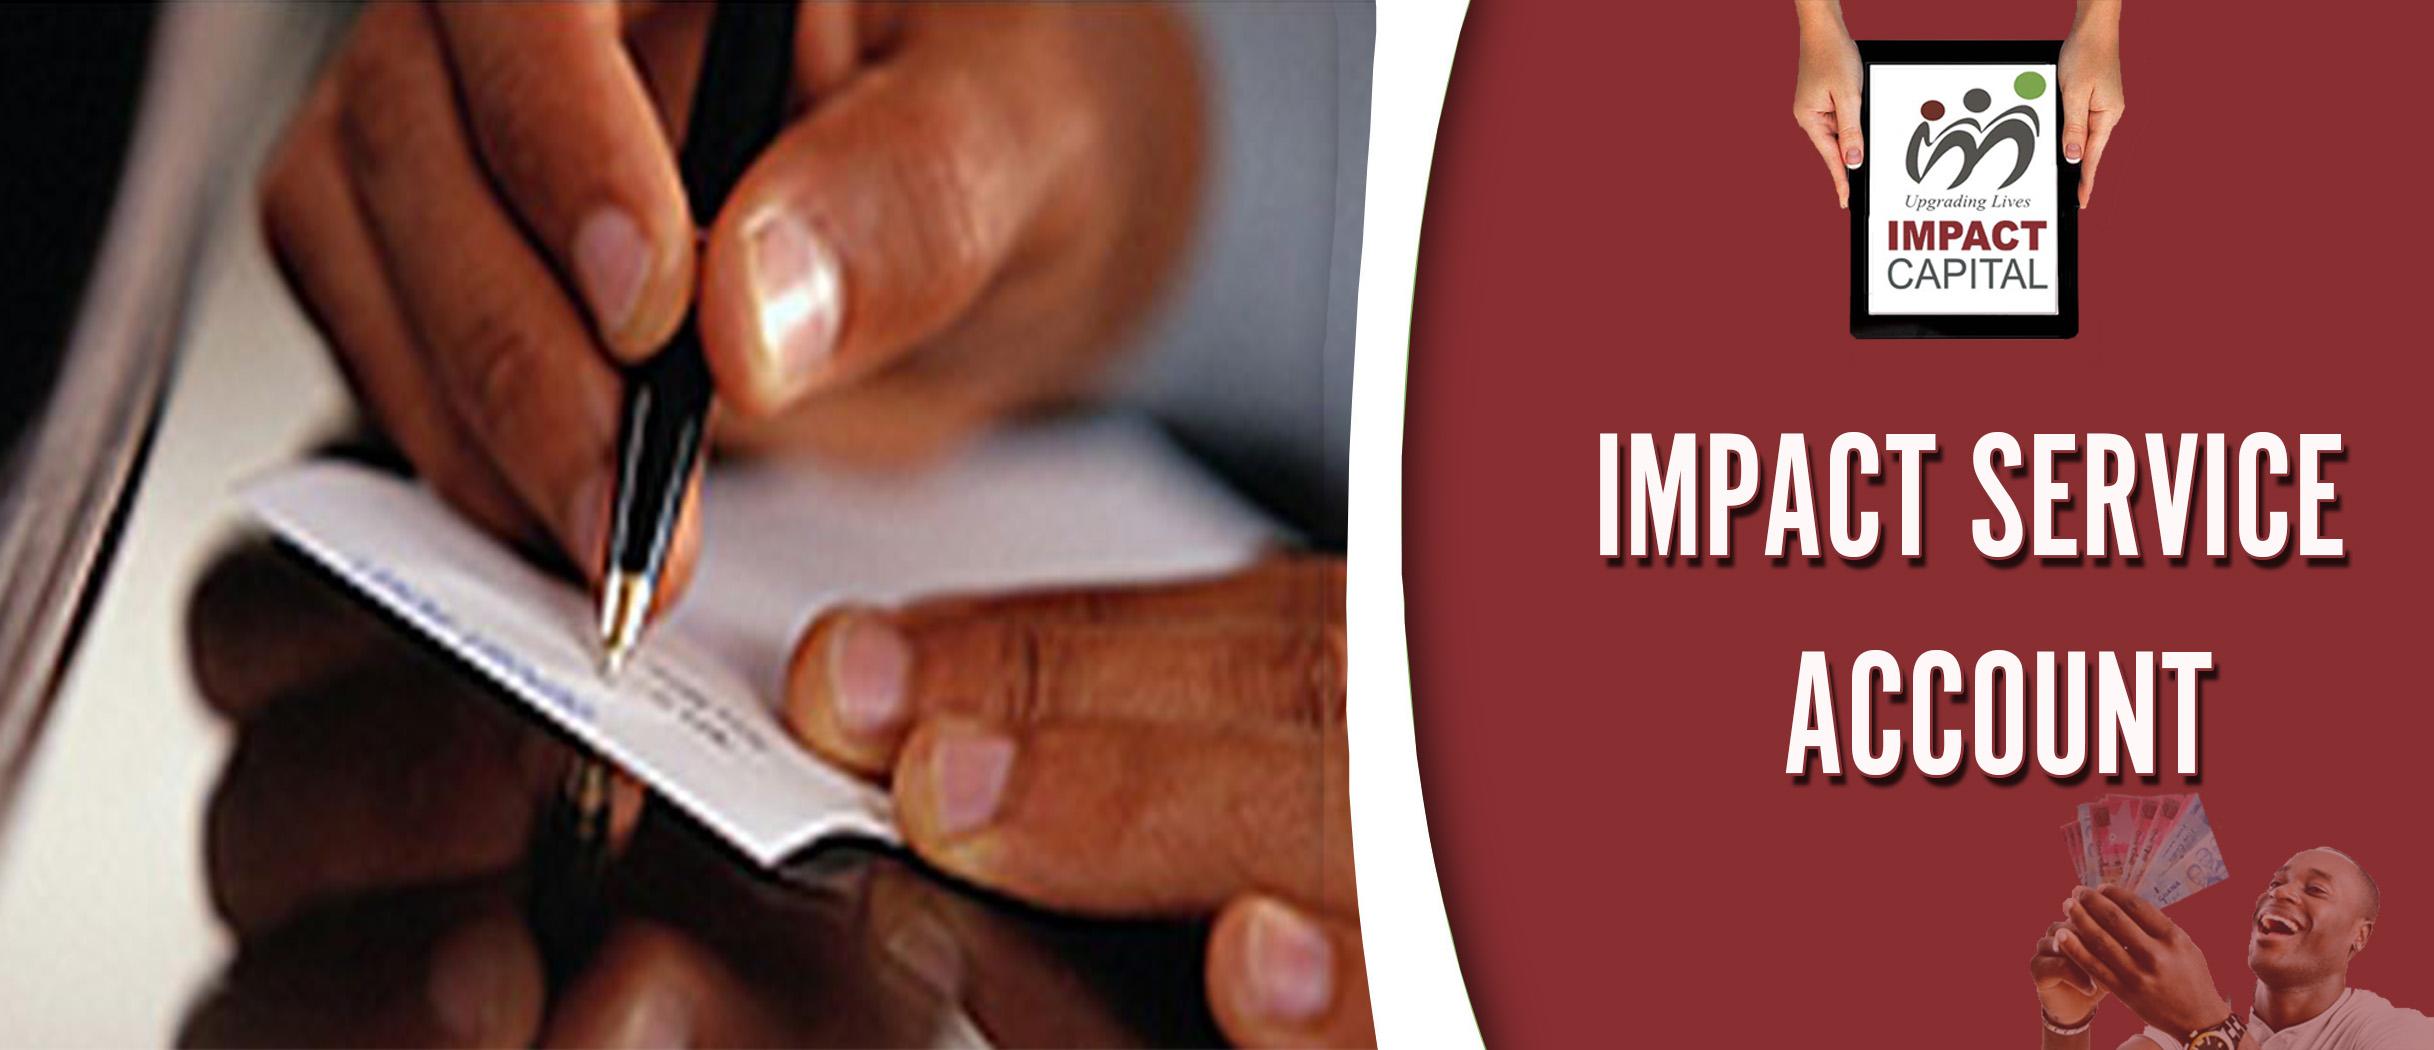 impact service acount